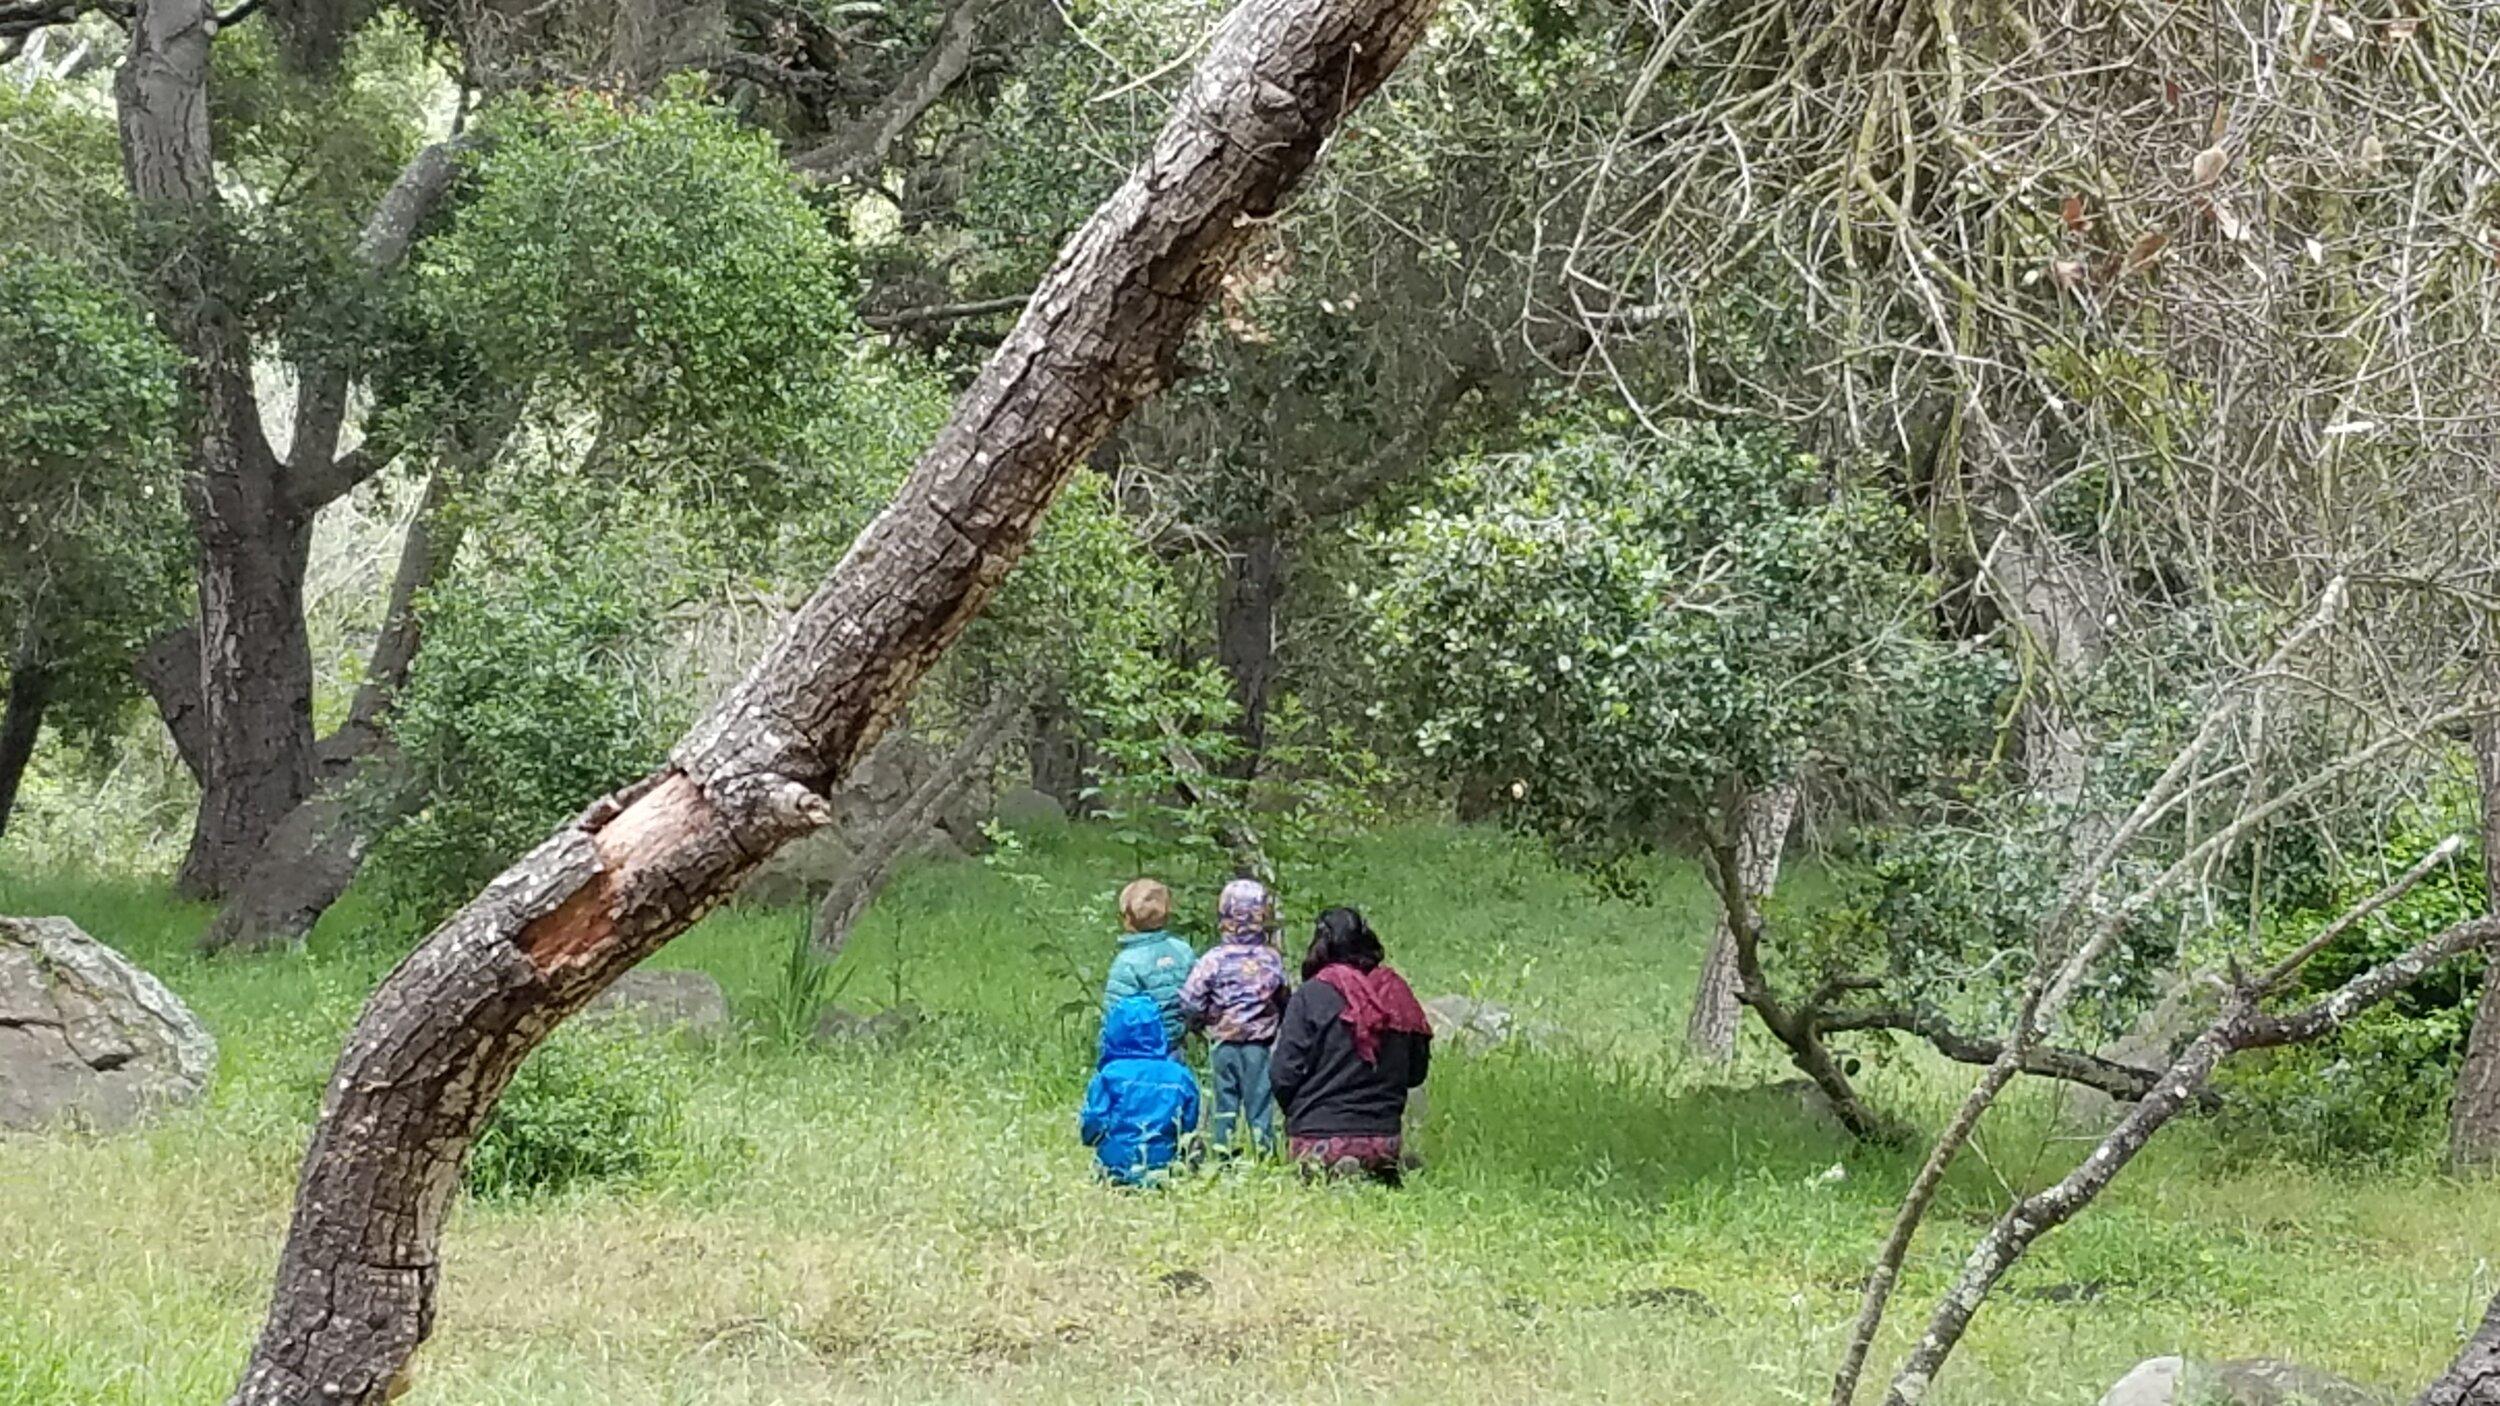 Wild Roots Forest School, Santa Barbara CA / courtesy of Lia Grippo